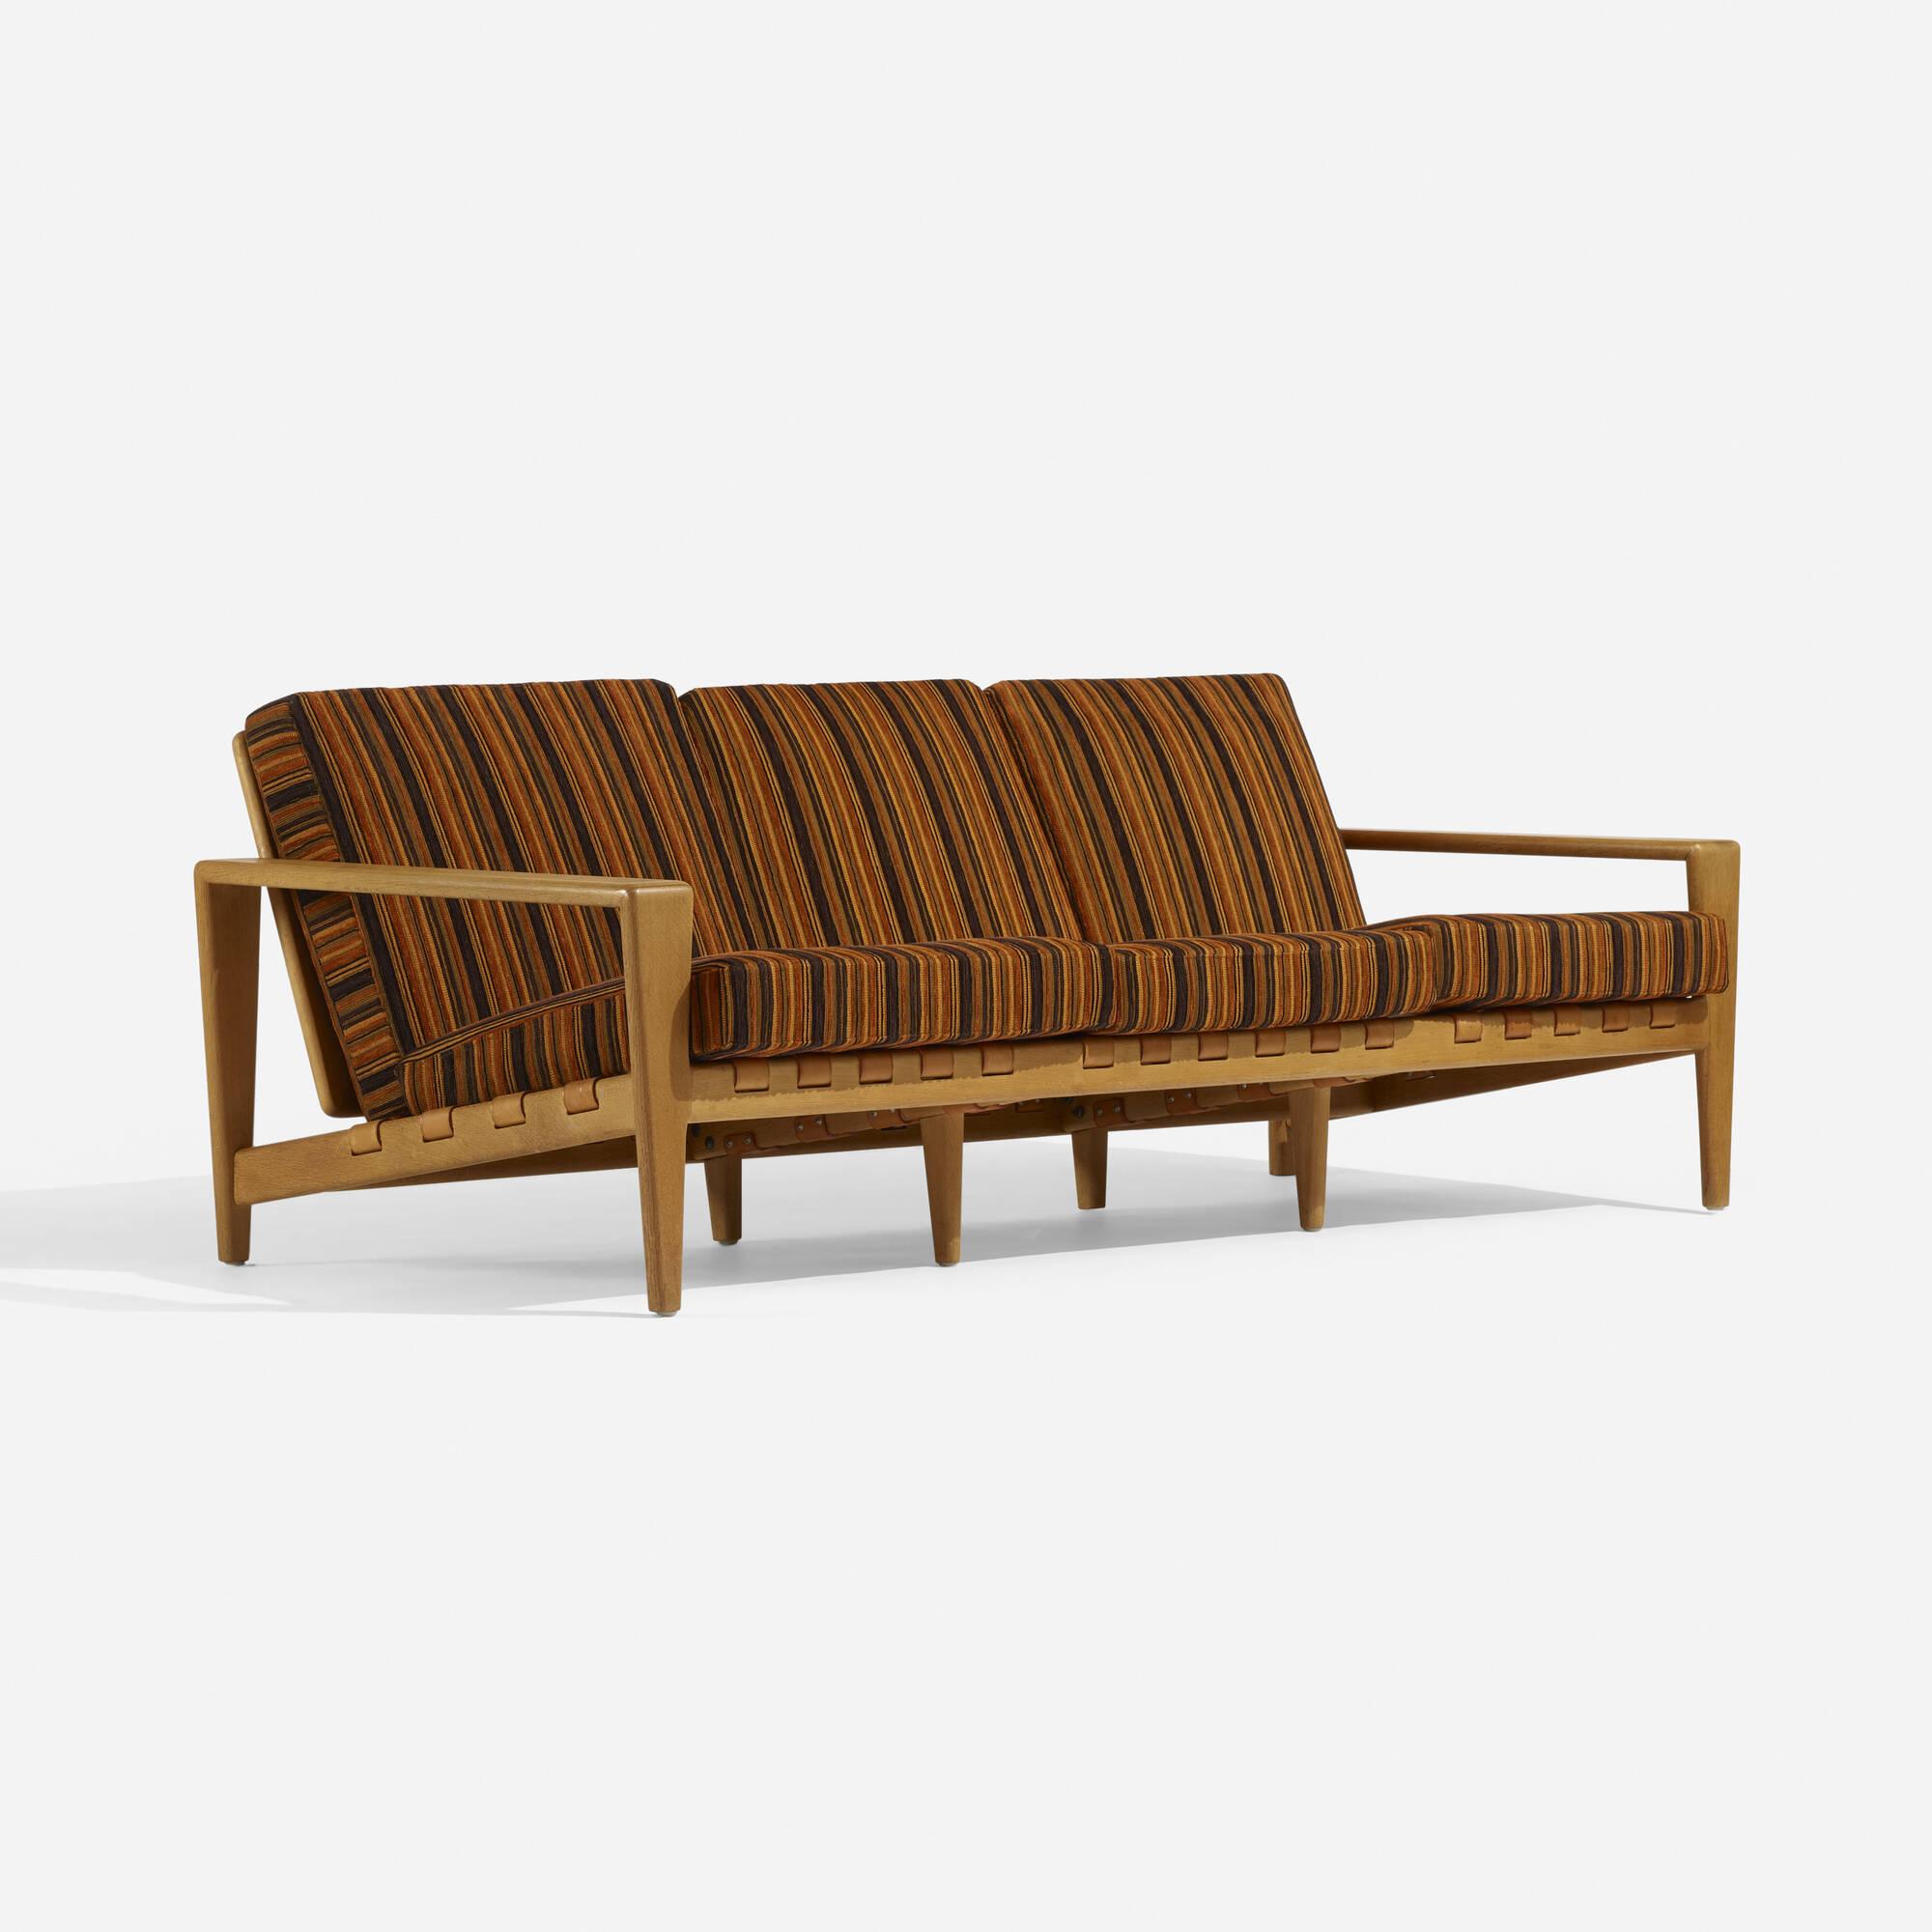 164: Svante Skogh / sofa (1 of 4)